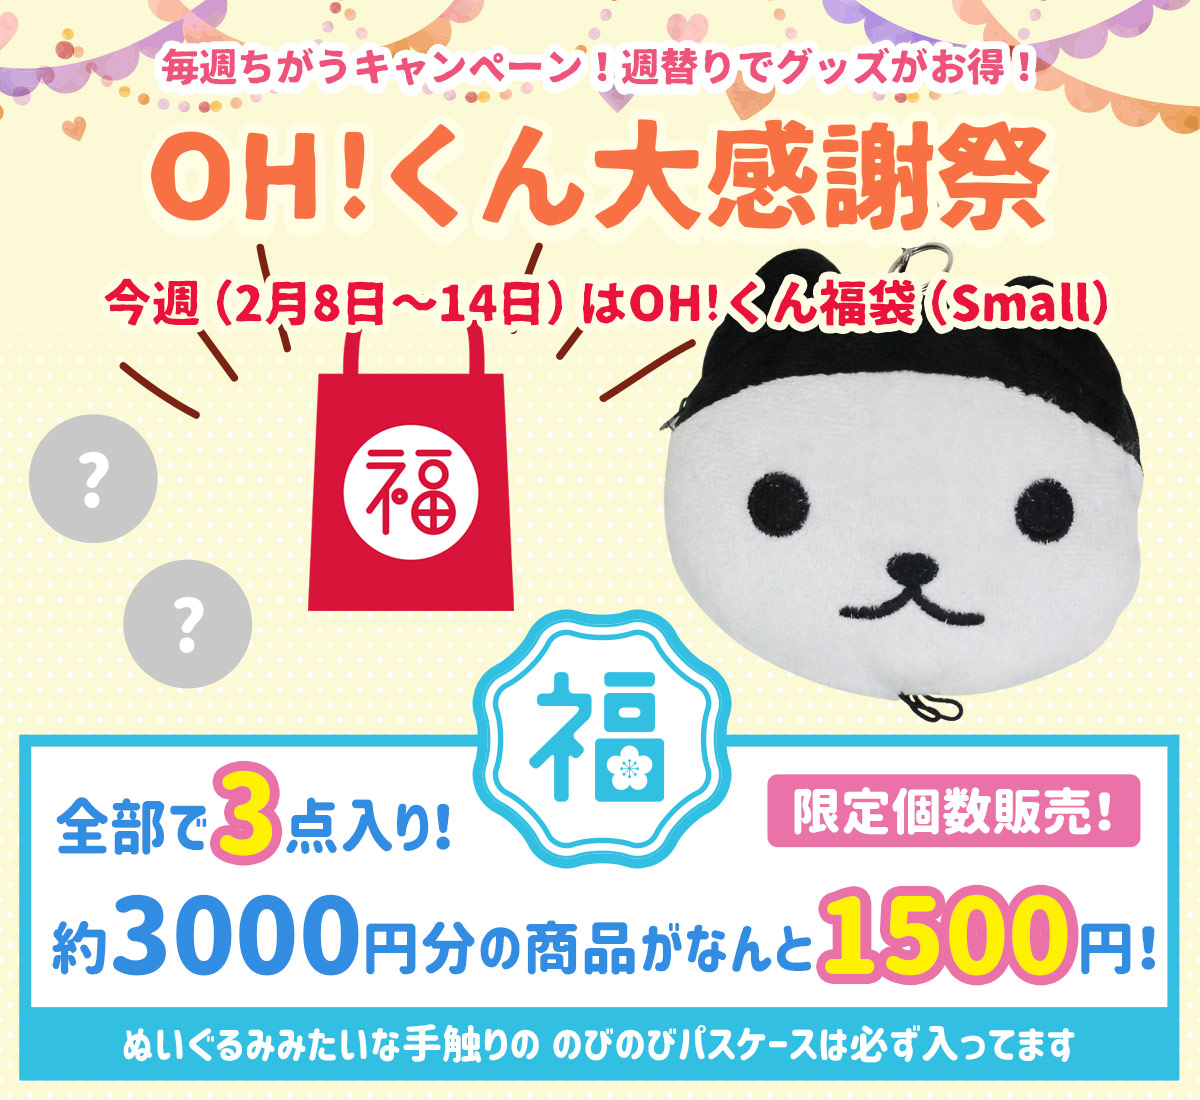 OH!くん感謝祭第2週は福袋(Small)!